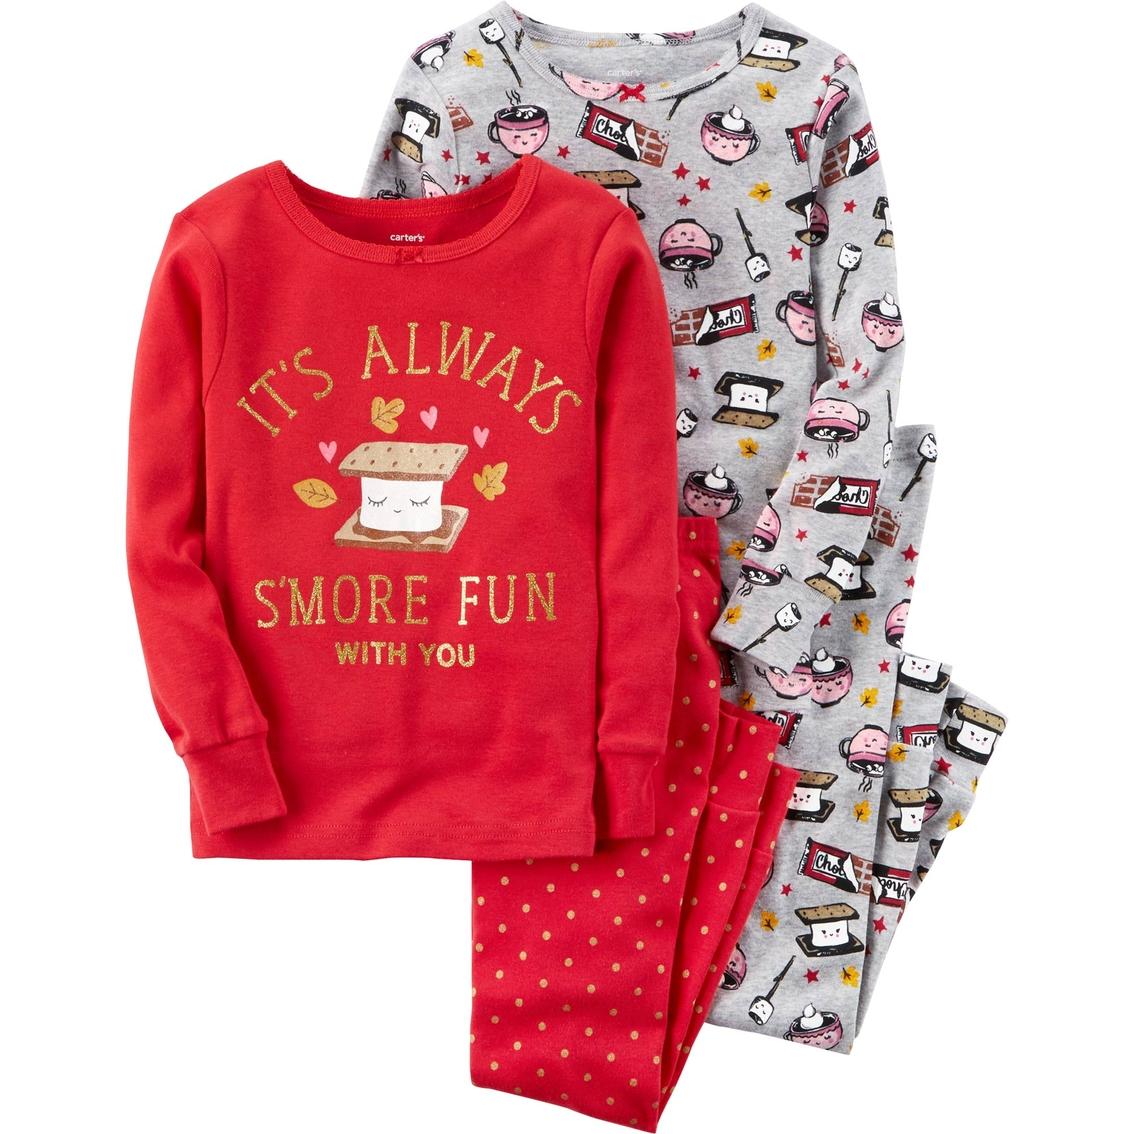 498a2c3e4 Carter's Girls 4 Pc. S'more Fun Pajama Set, Size 7 | Girls 7-16 ...